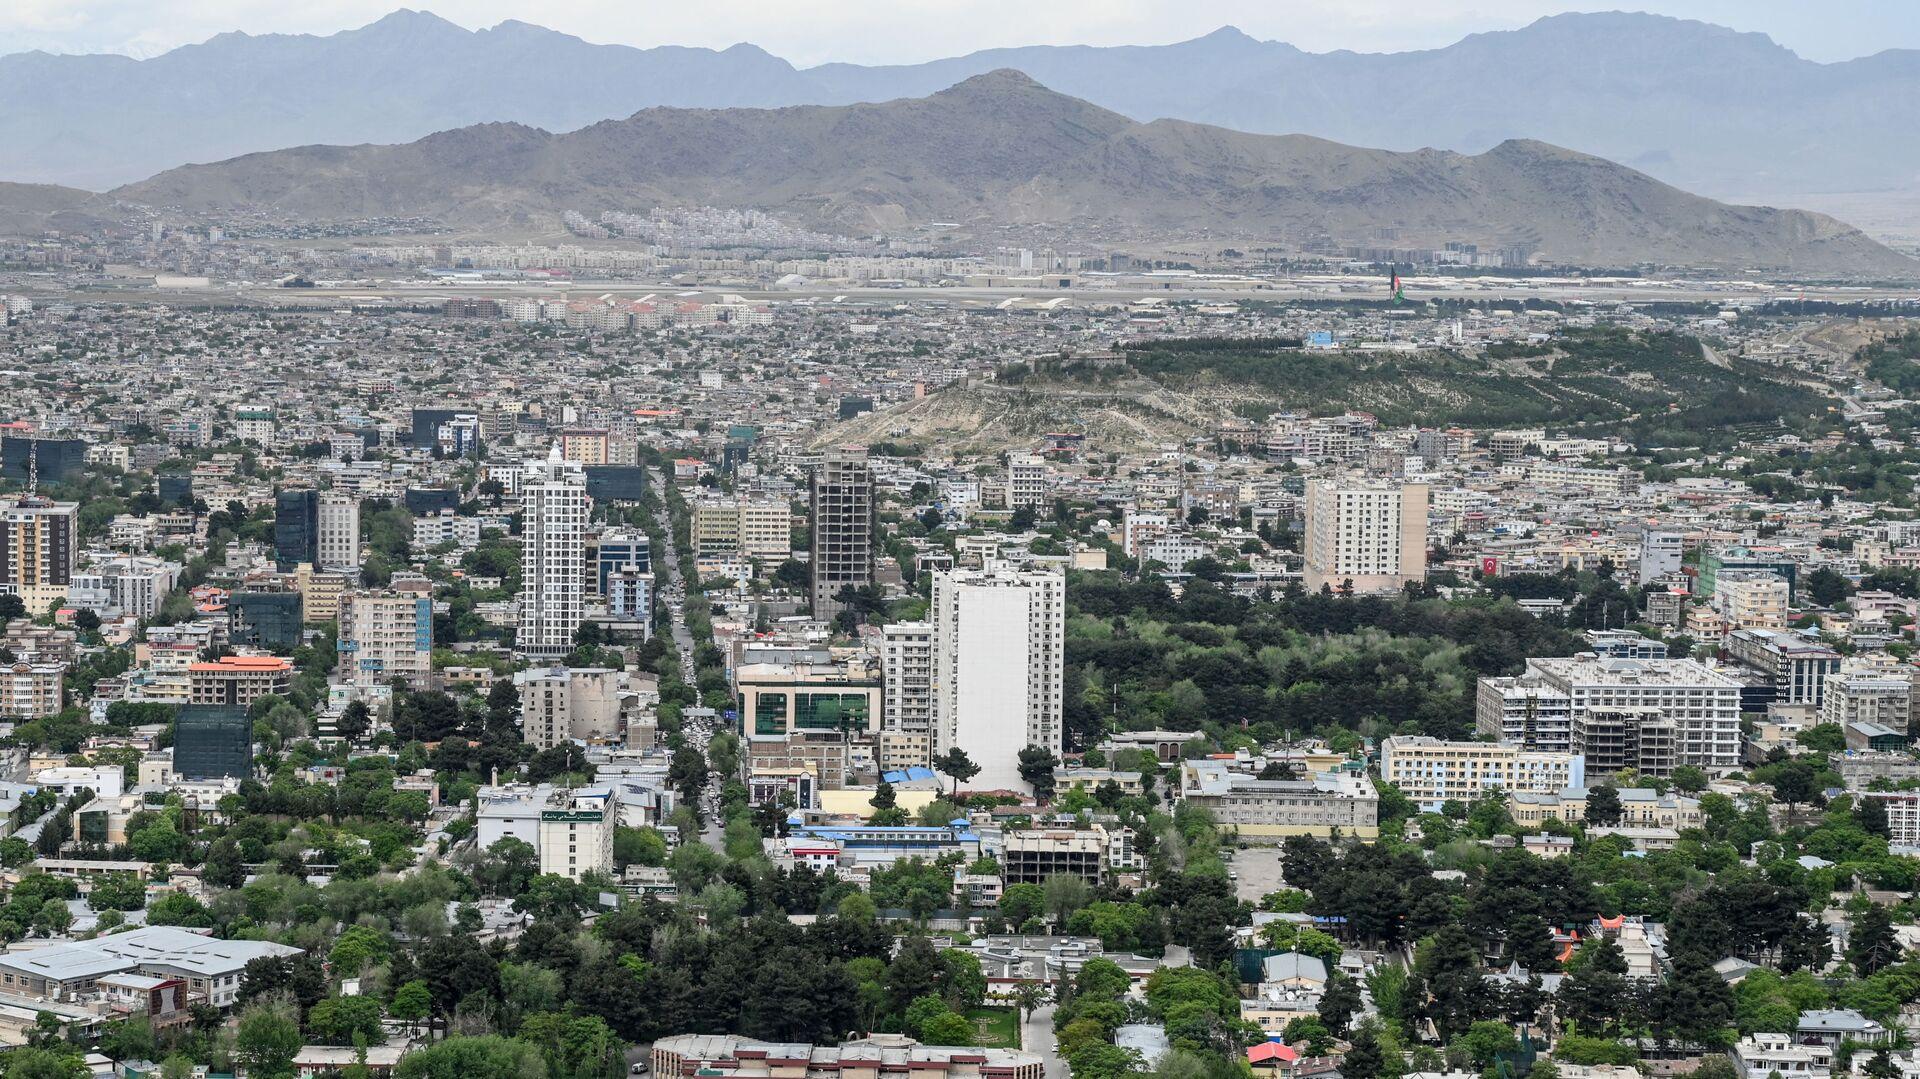 Вид на Кабул, фото из архива - Sputnik Azərbaycan, 1920, 12.09.2021